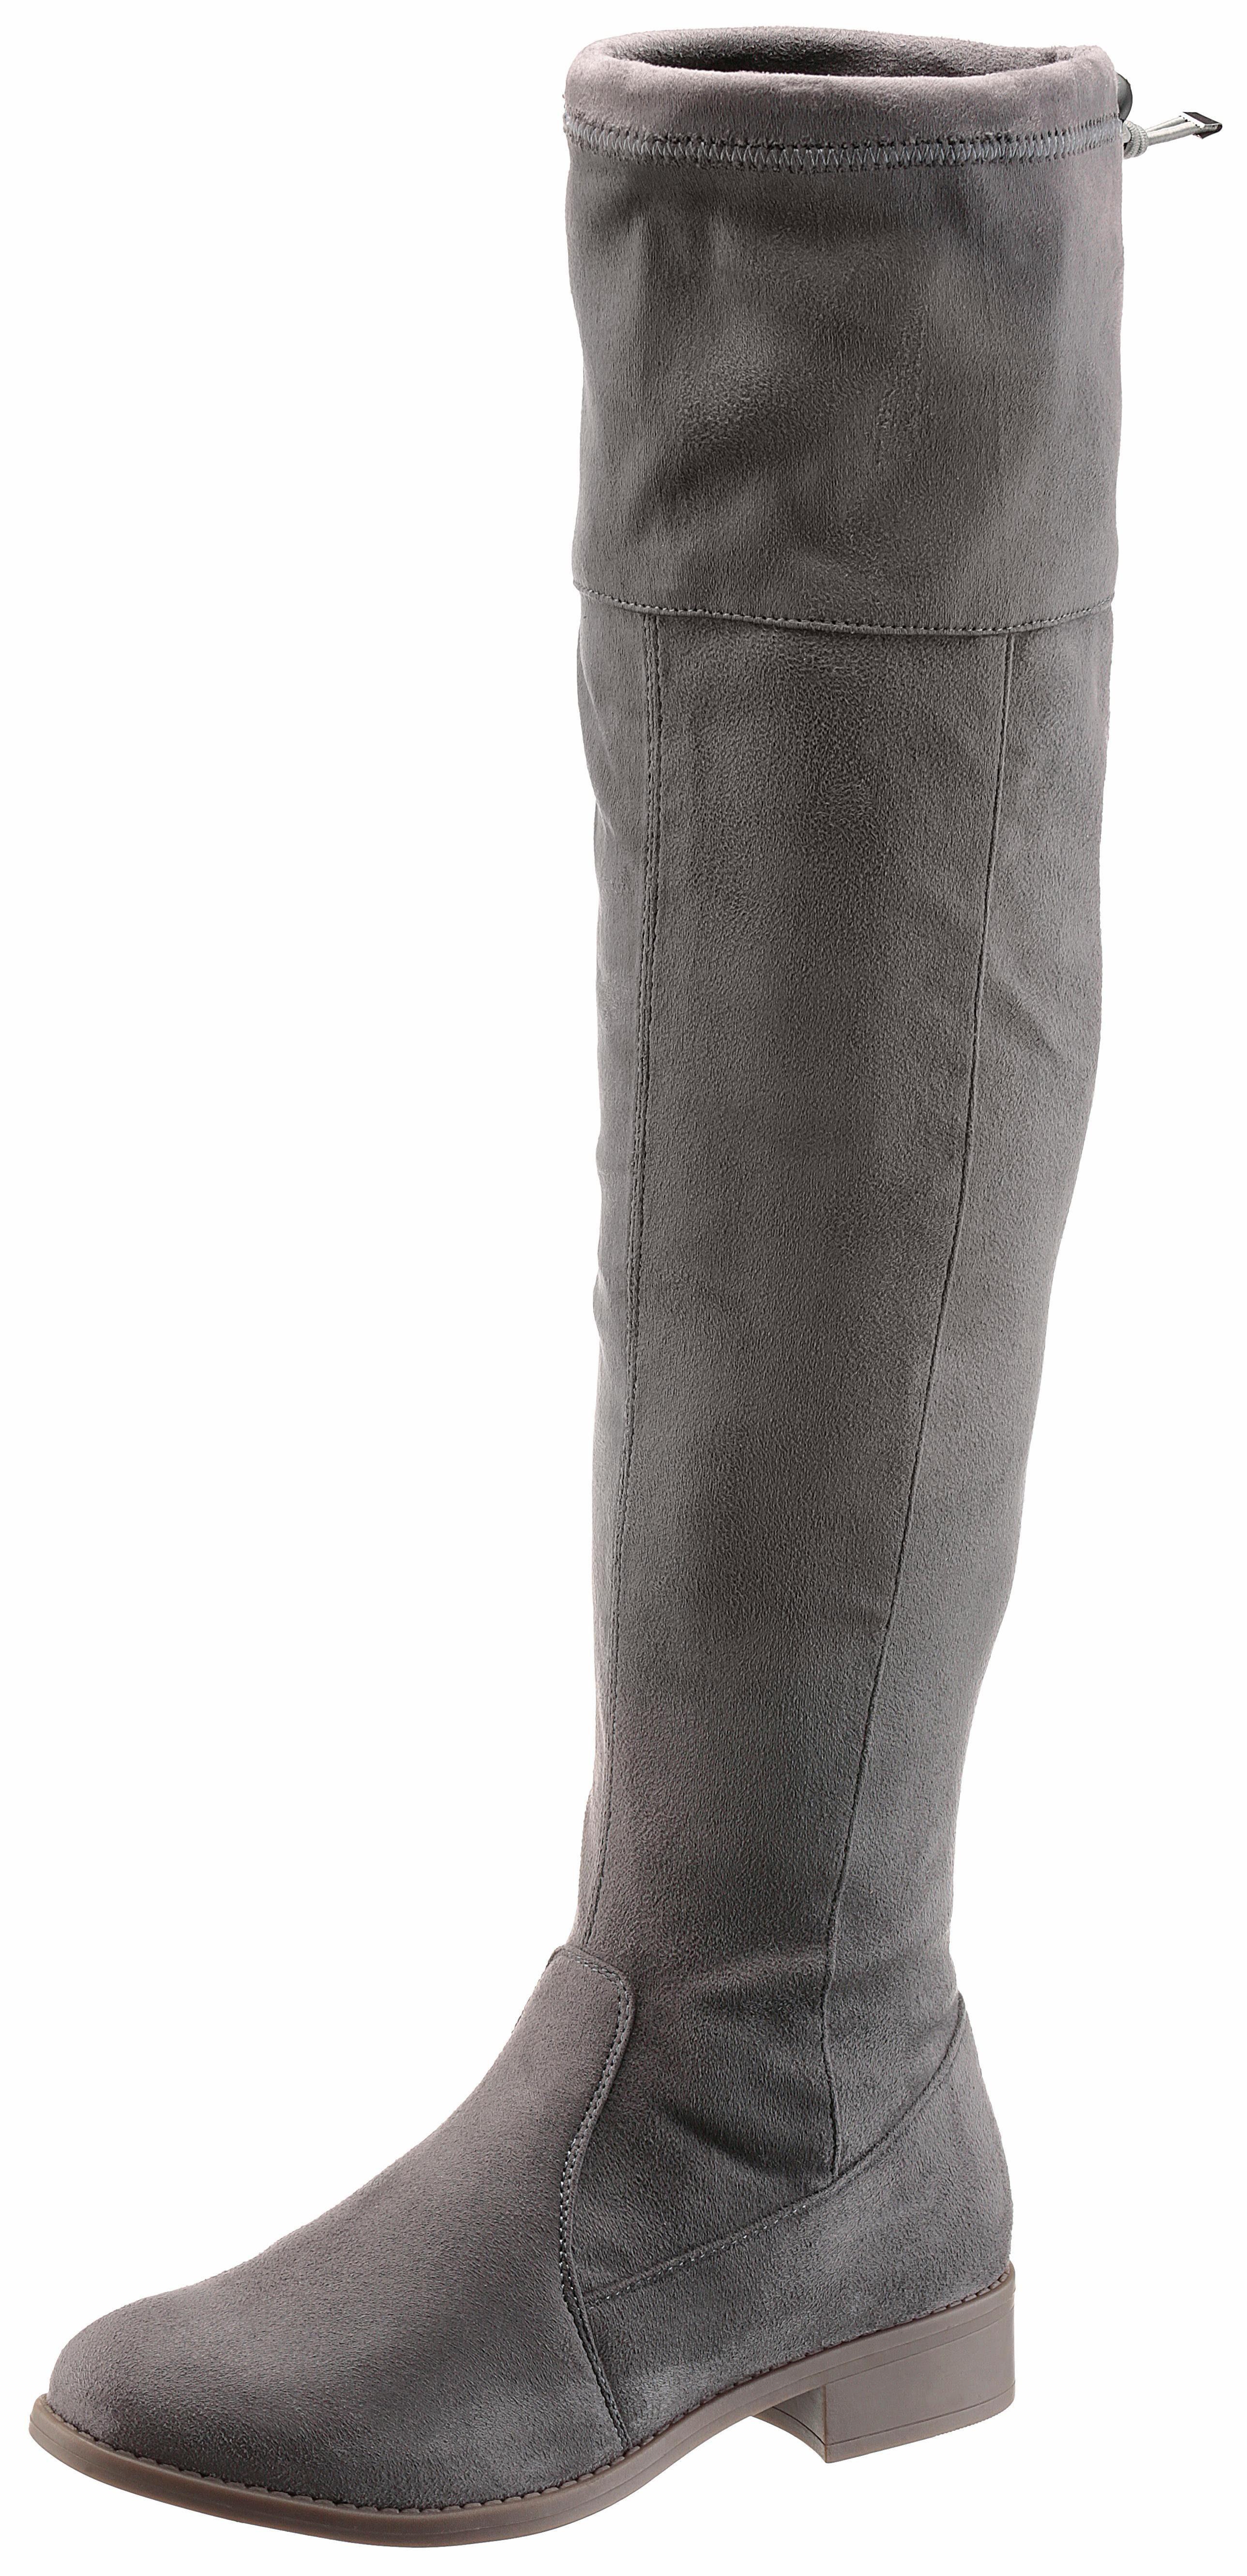 Arizona Overkneestiefel, in klassischem Look, grau, Normalschaft, EURO-Größen, grau